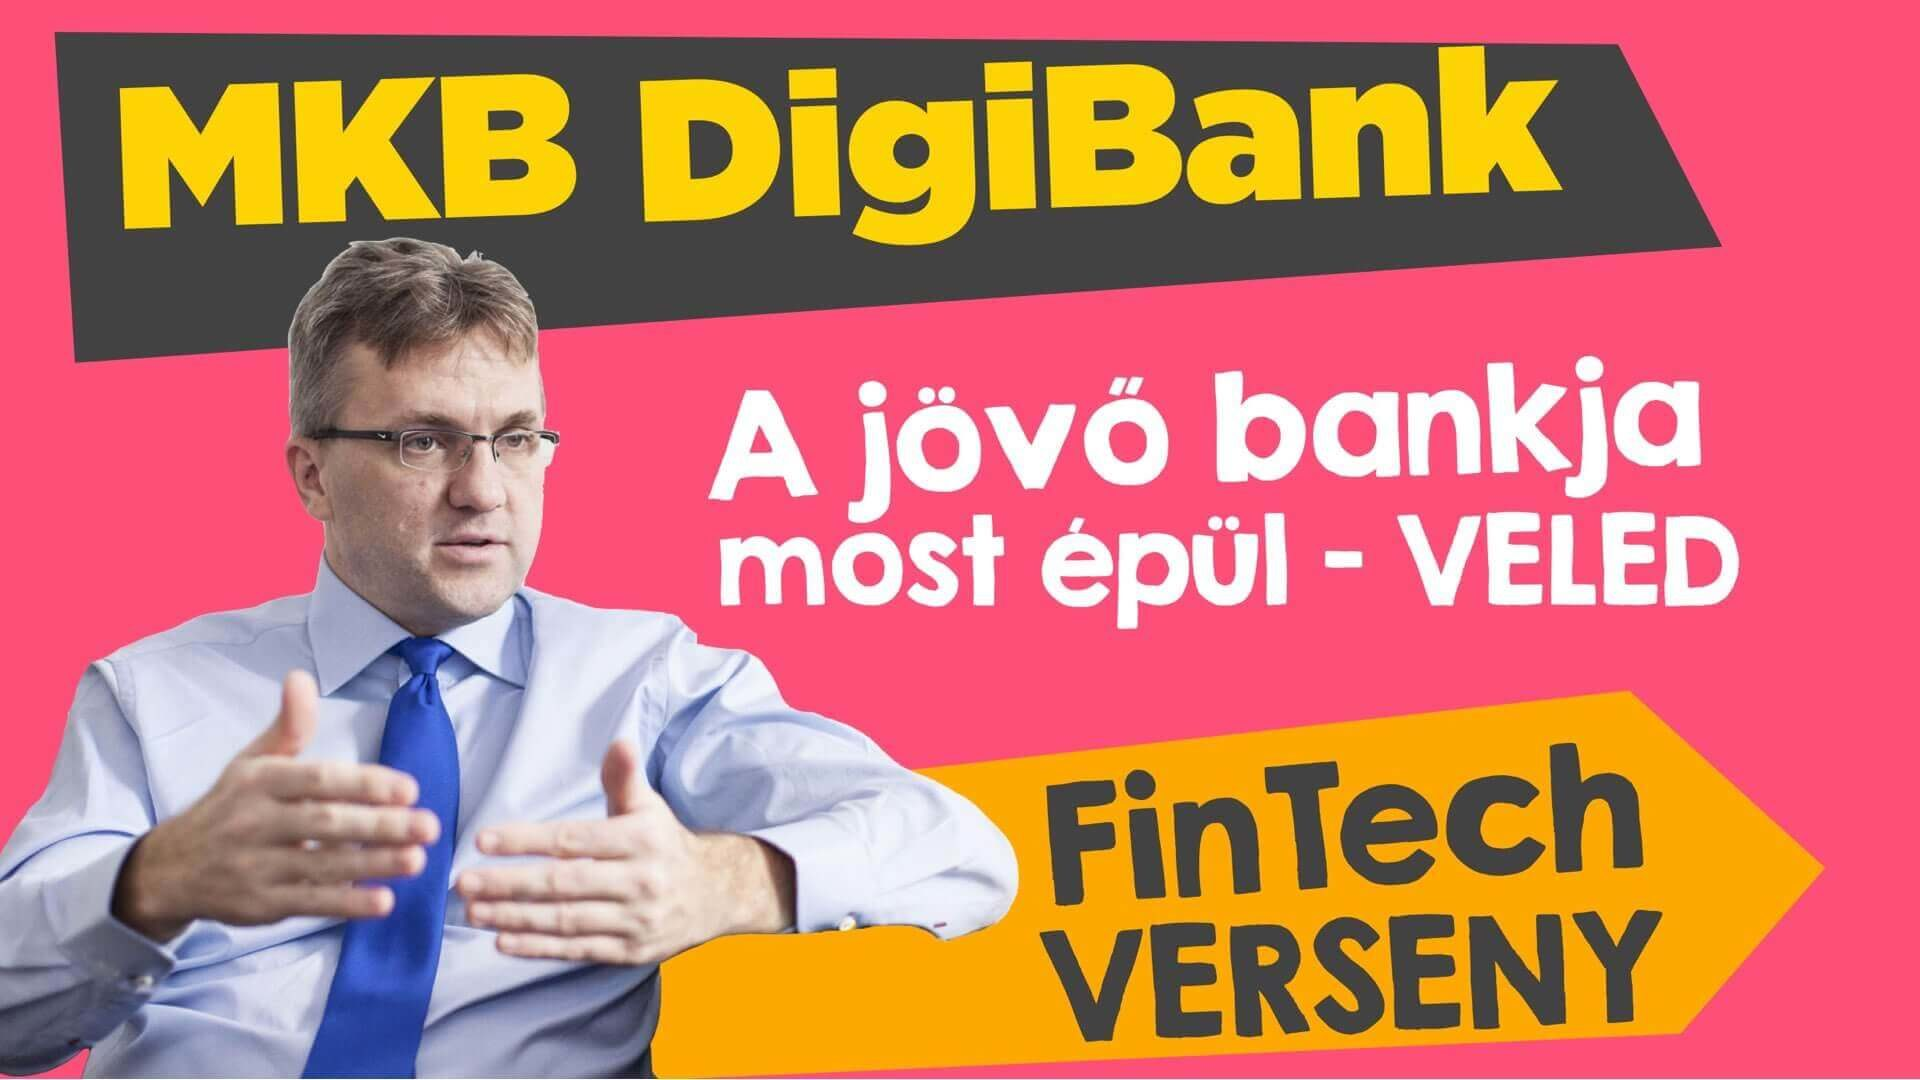 MKB DigiBank: FinTech verseny